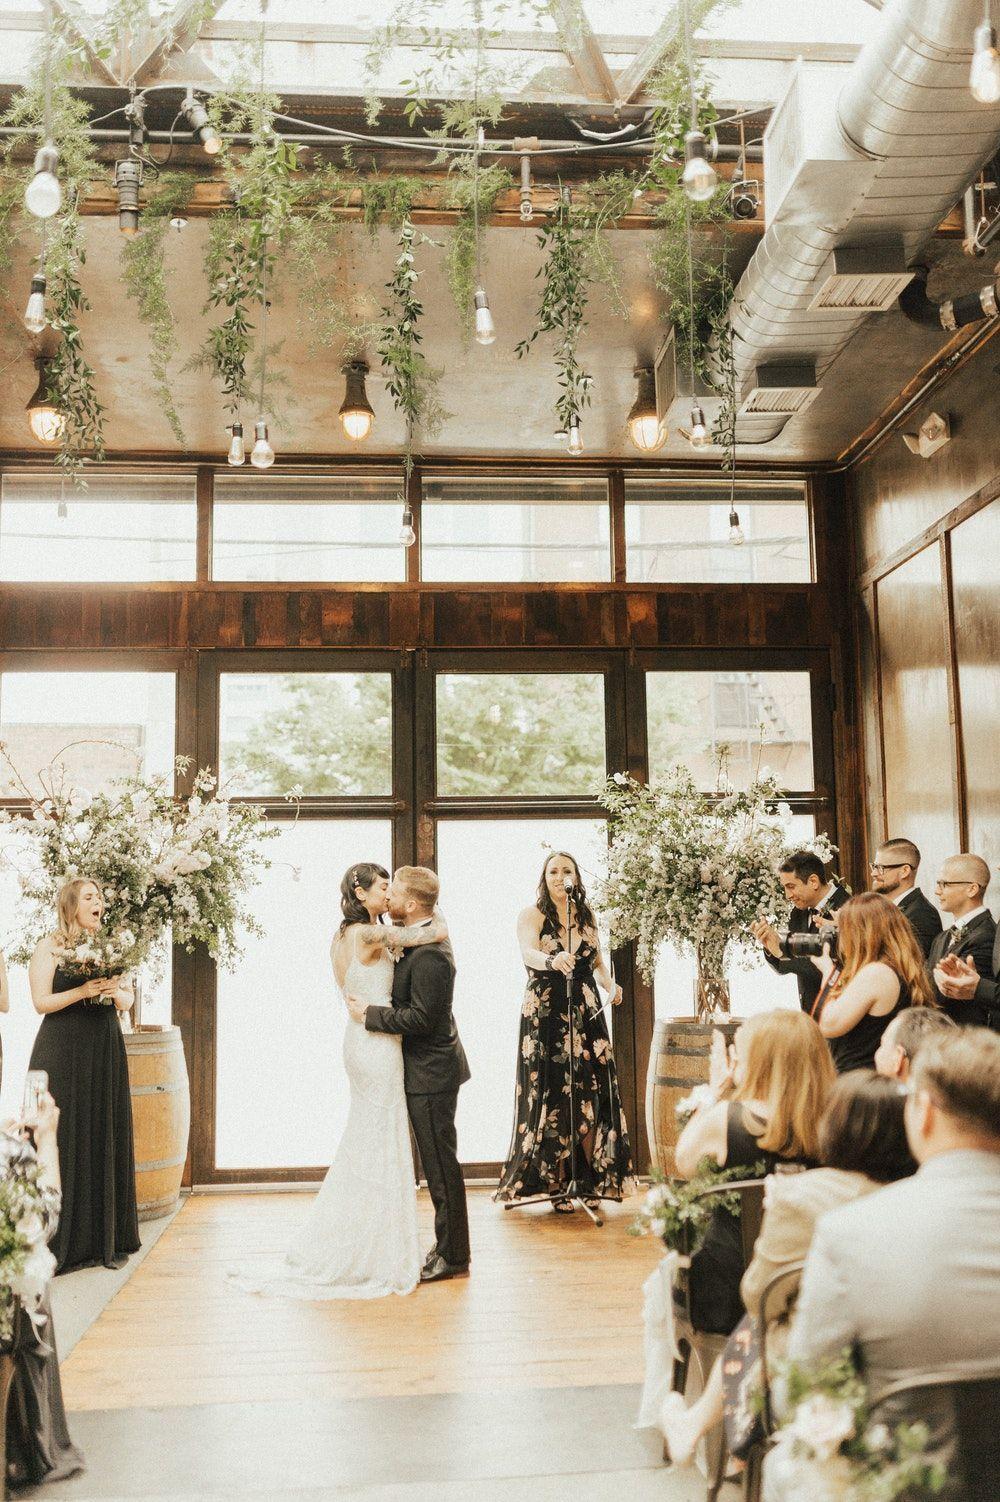 Light Flooded Vintage Wedding At Brooklyn Winery New York Wedding Venues Brooklyn Winery Wedding [ 1502 x 1000 Pixel ]